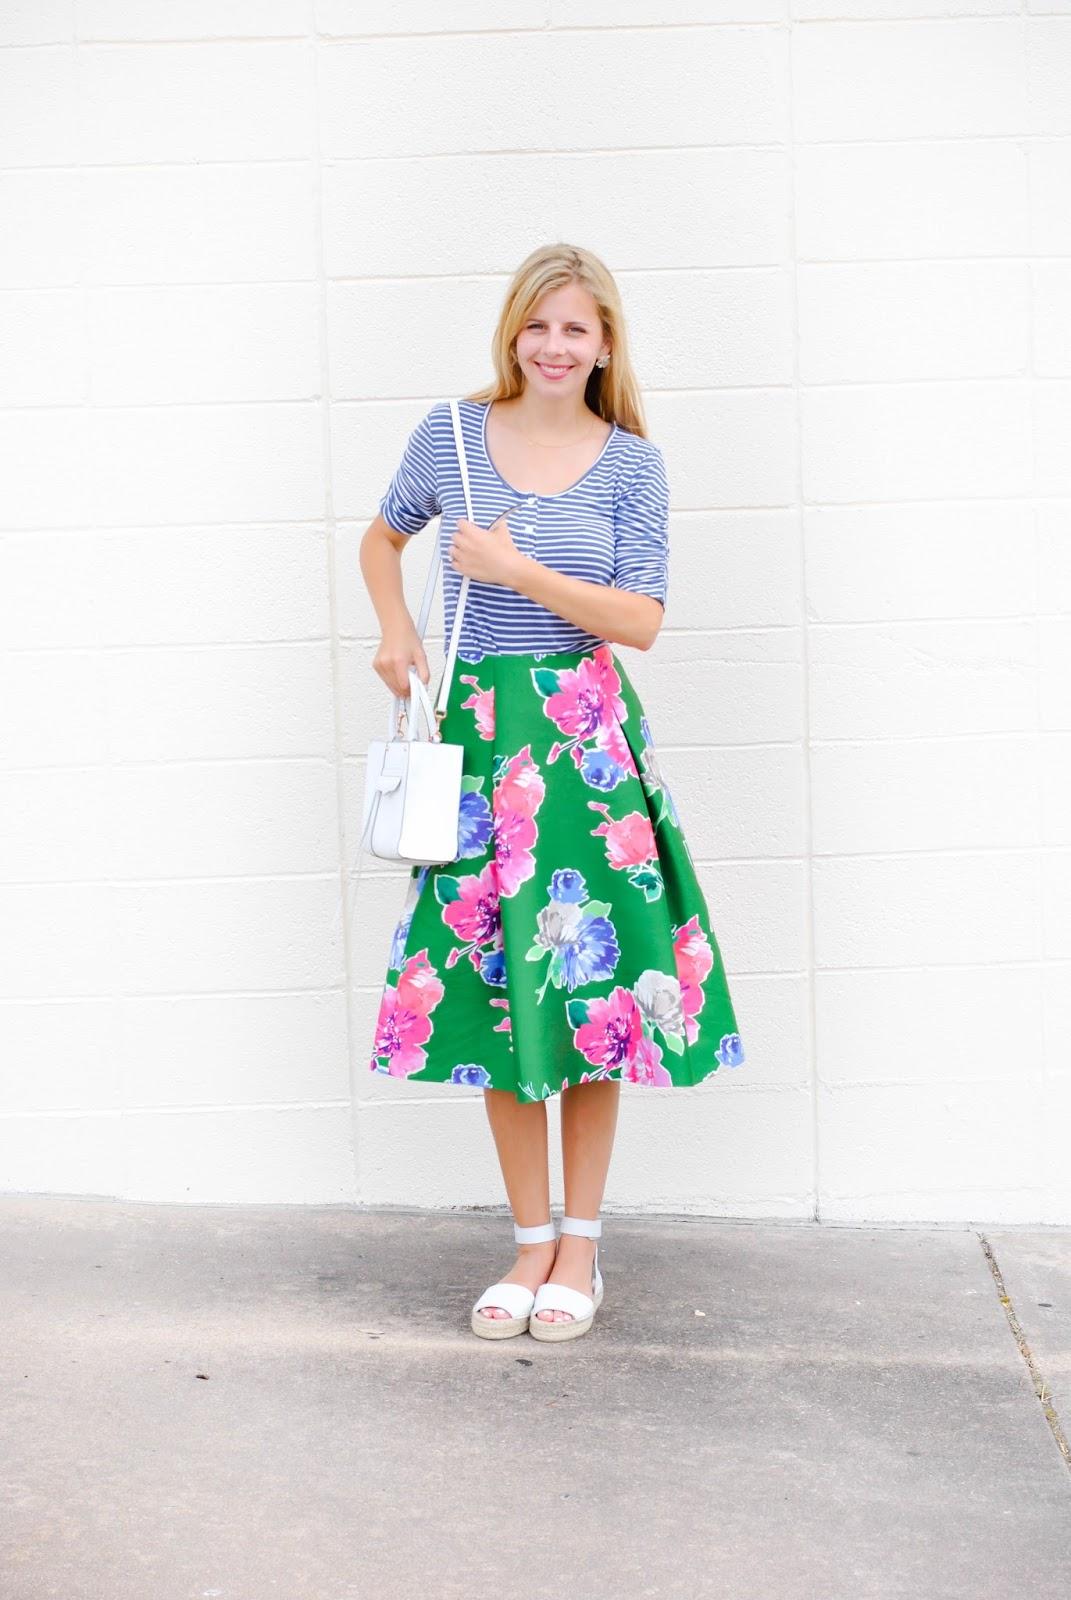 The Chic Burrow Austin Fashion Blog Charlottesville Fashion Blog